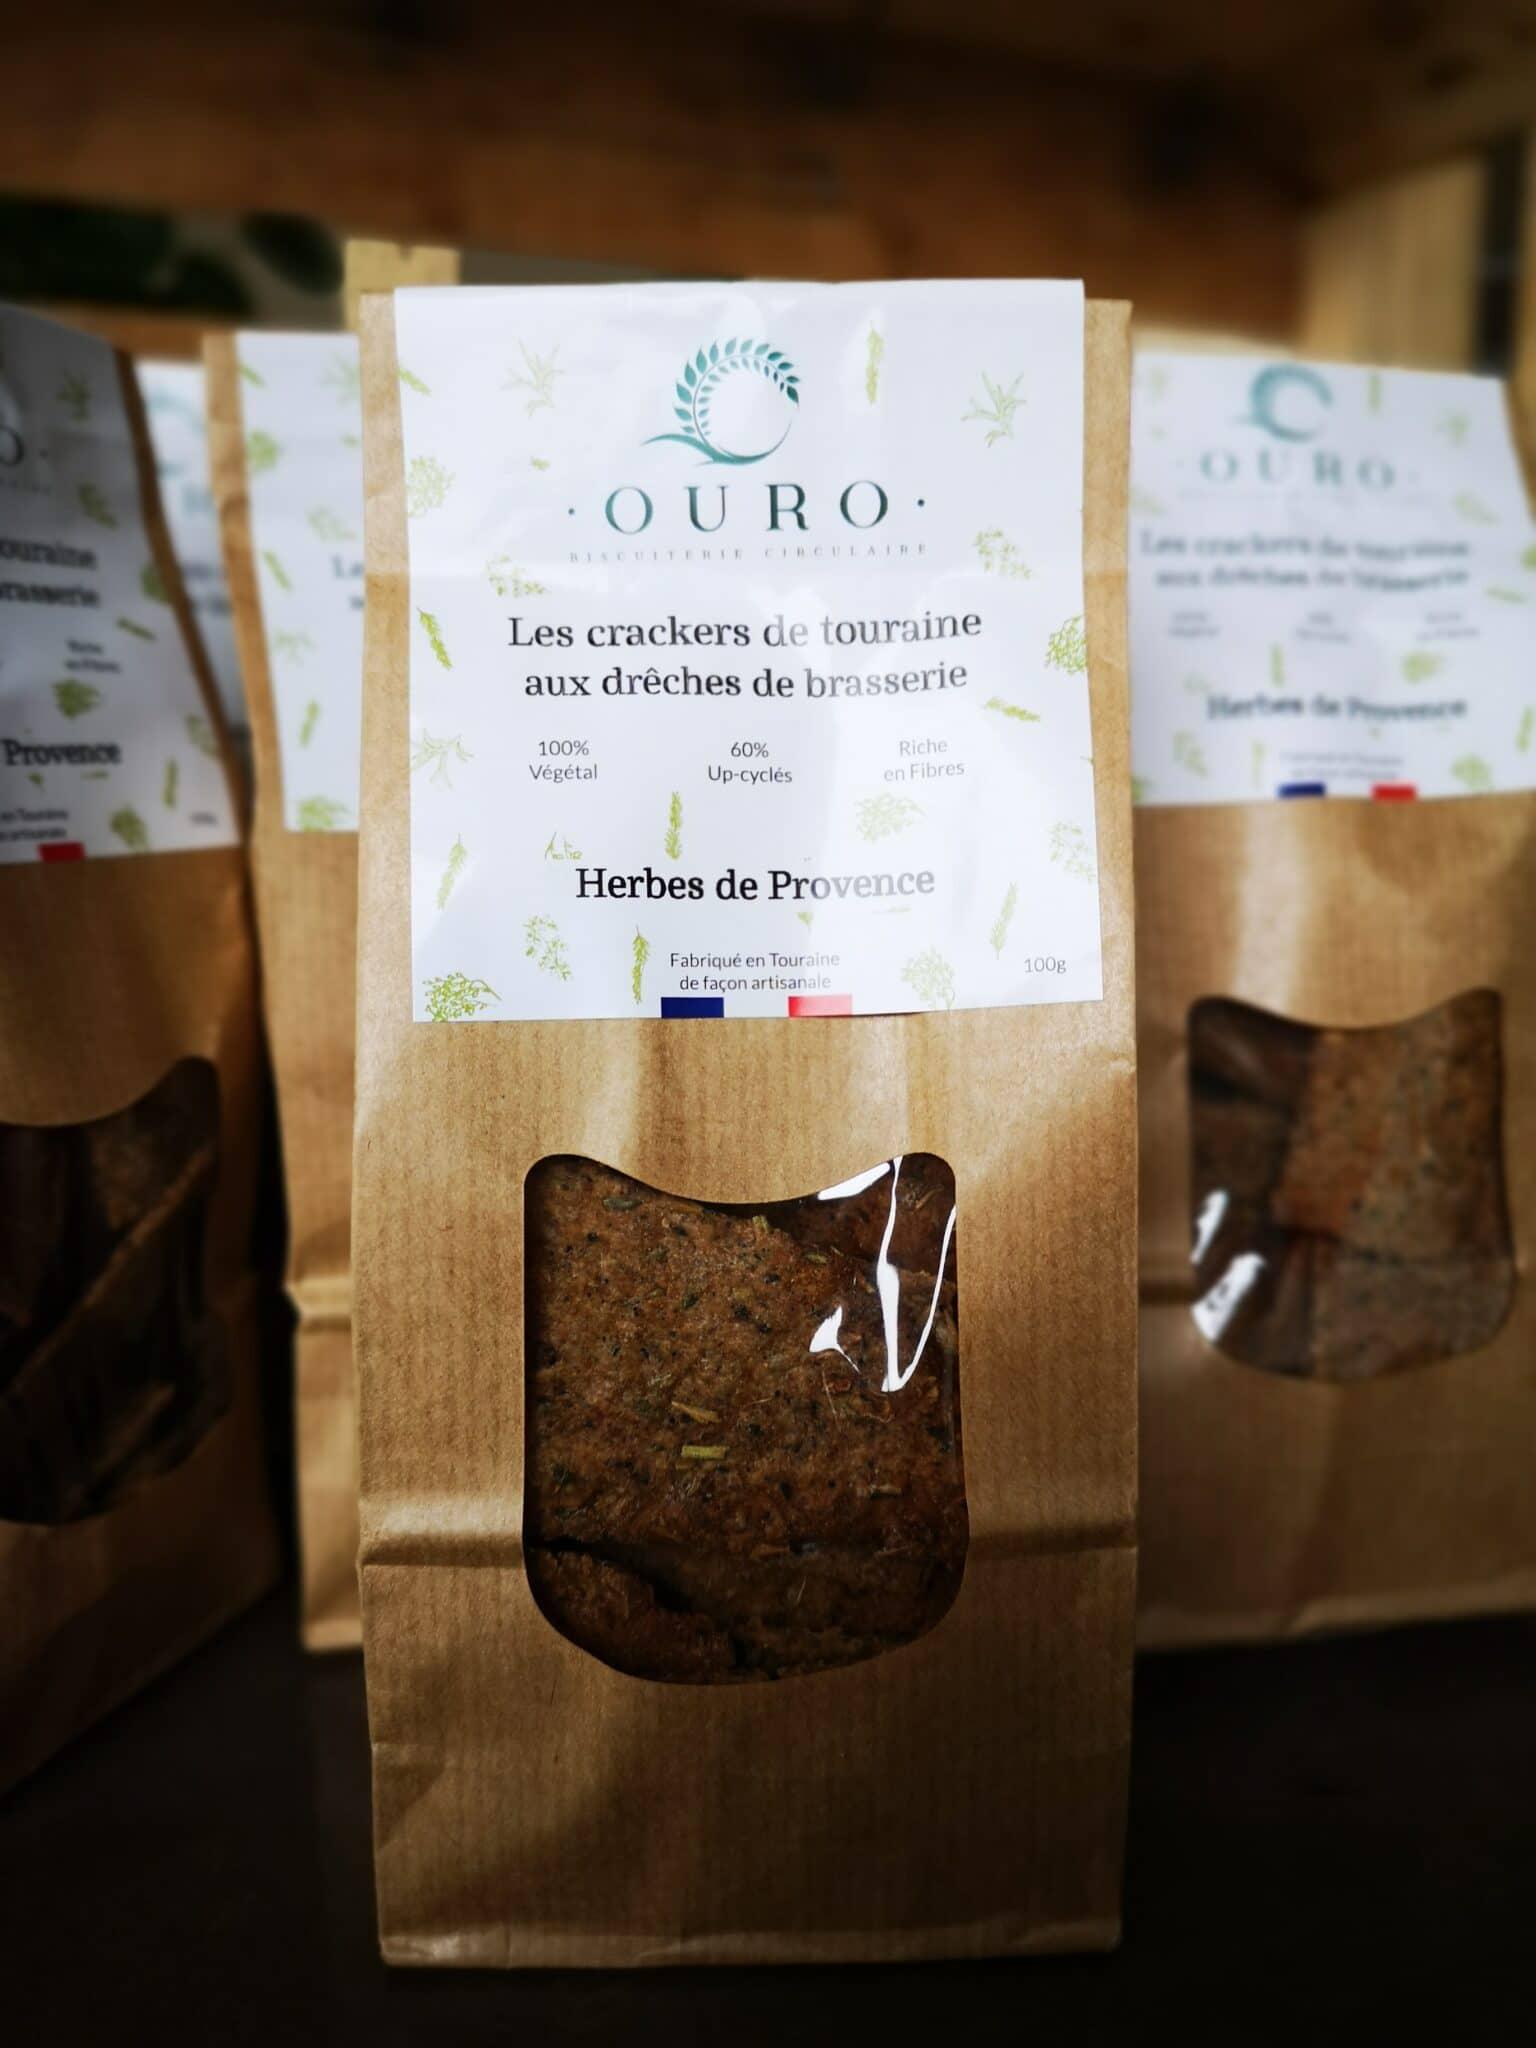 Crackers drêches de Brasserie herbes de Provence Biscuiterie OURO biscuiterie circulaire de Touraine